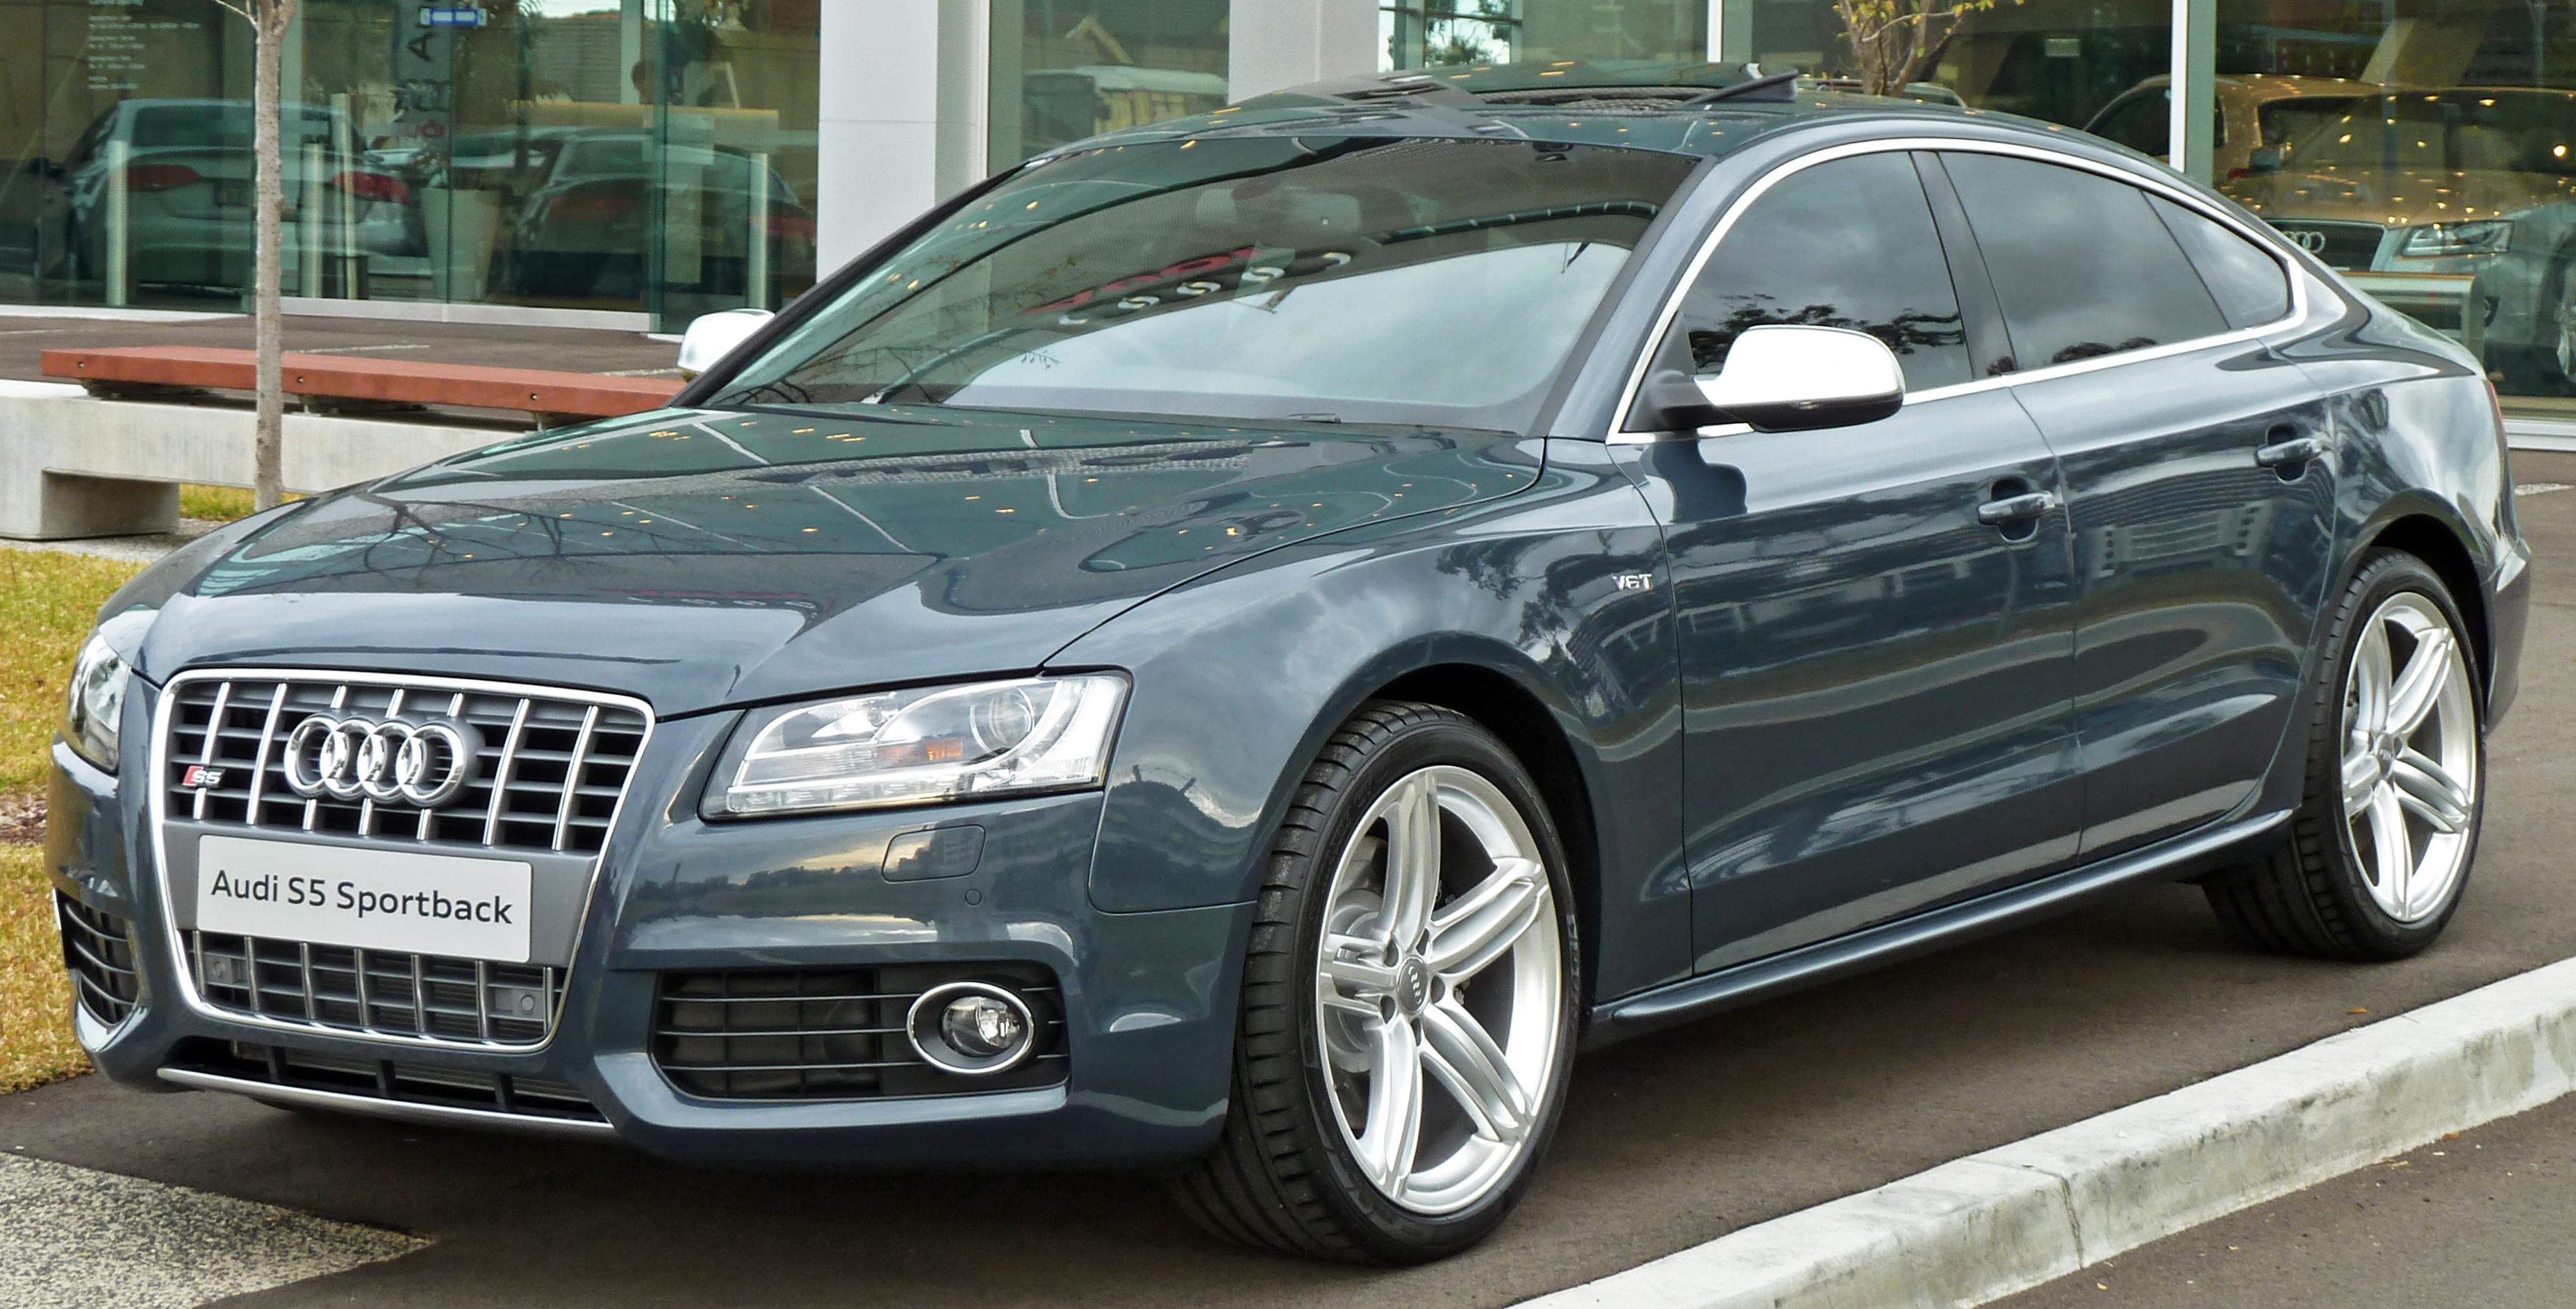 File:2010 Audi S5 (8T) Sportback 01.jpg - Wikimedia Commons